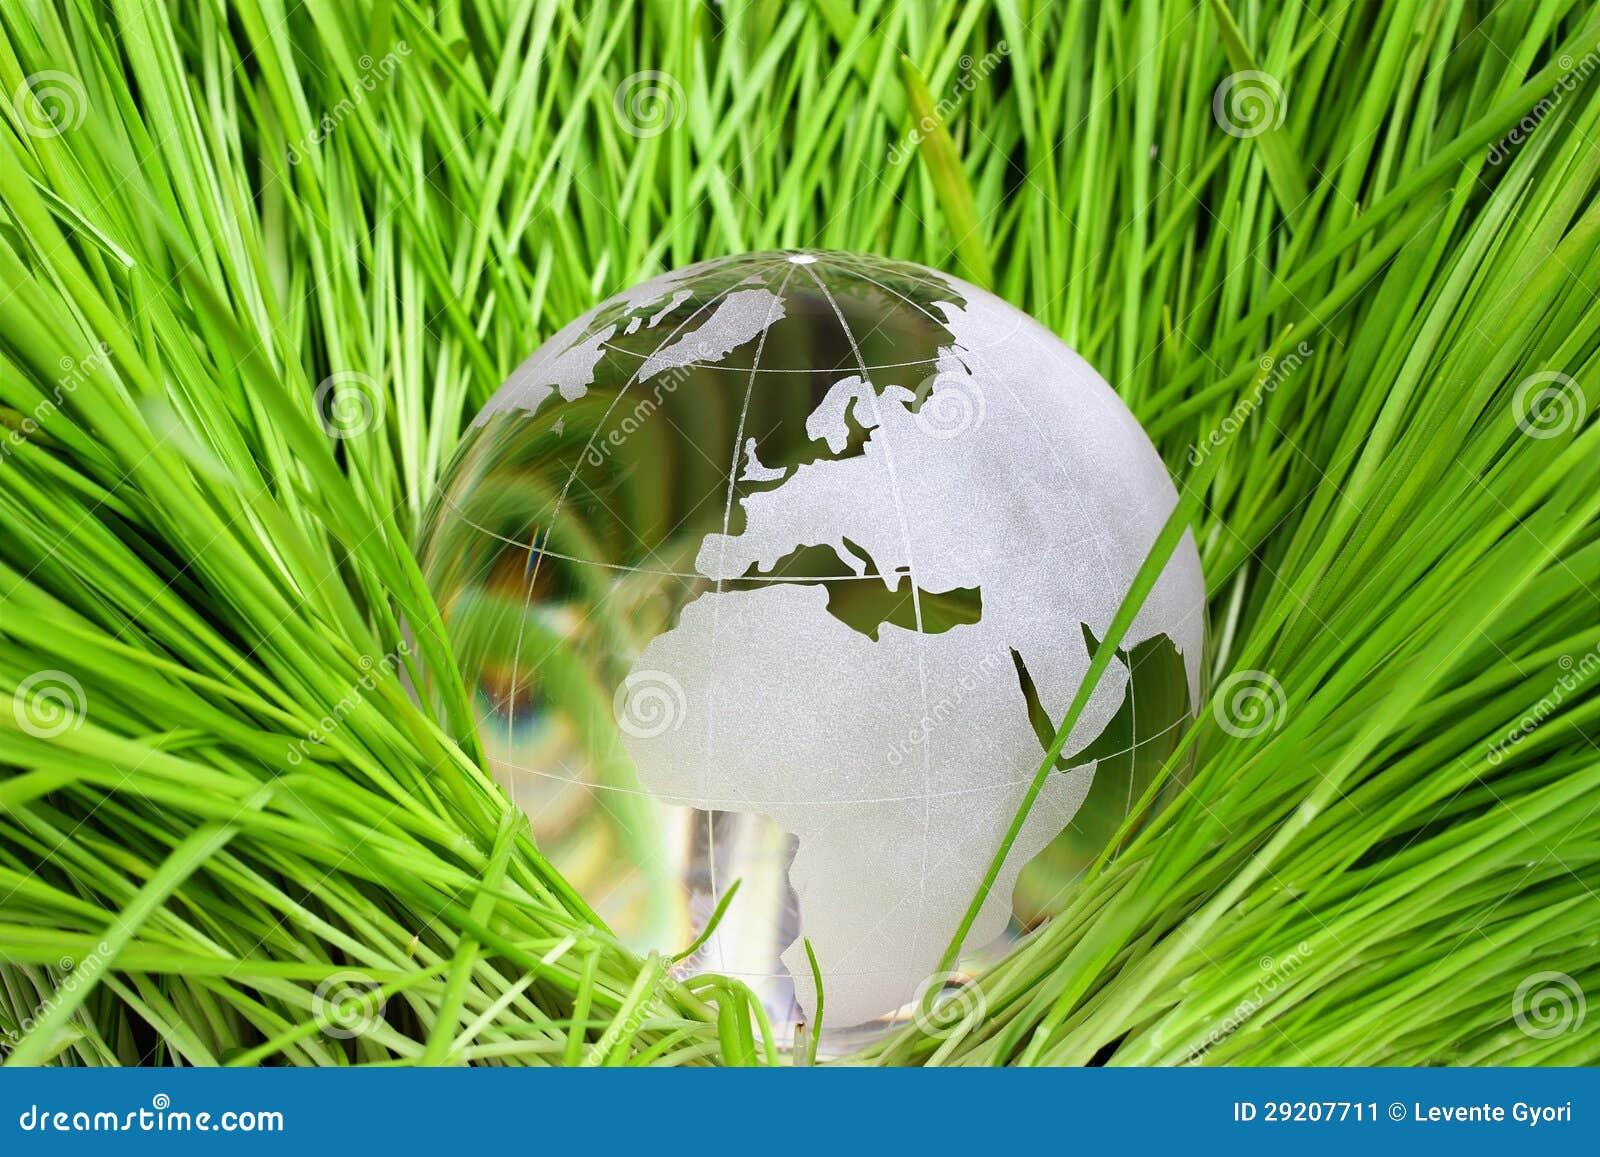 Jord i grönt gräs